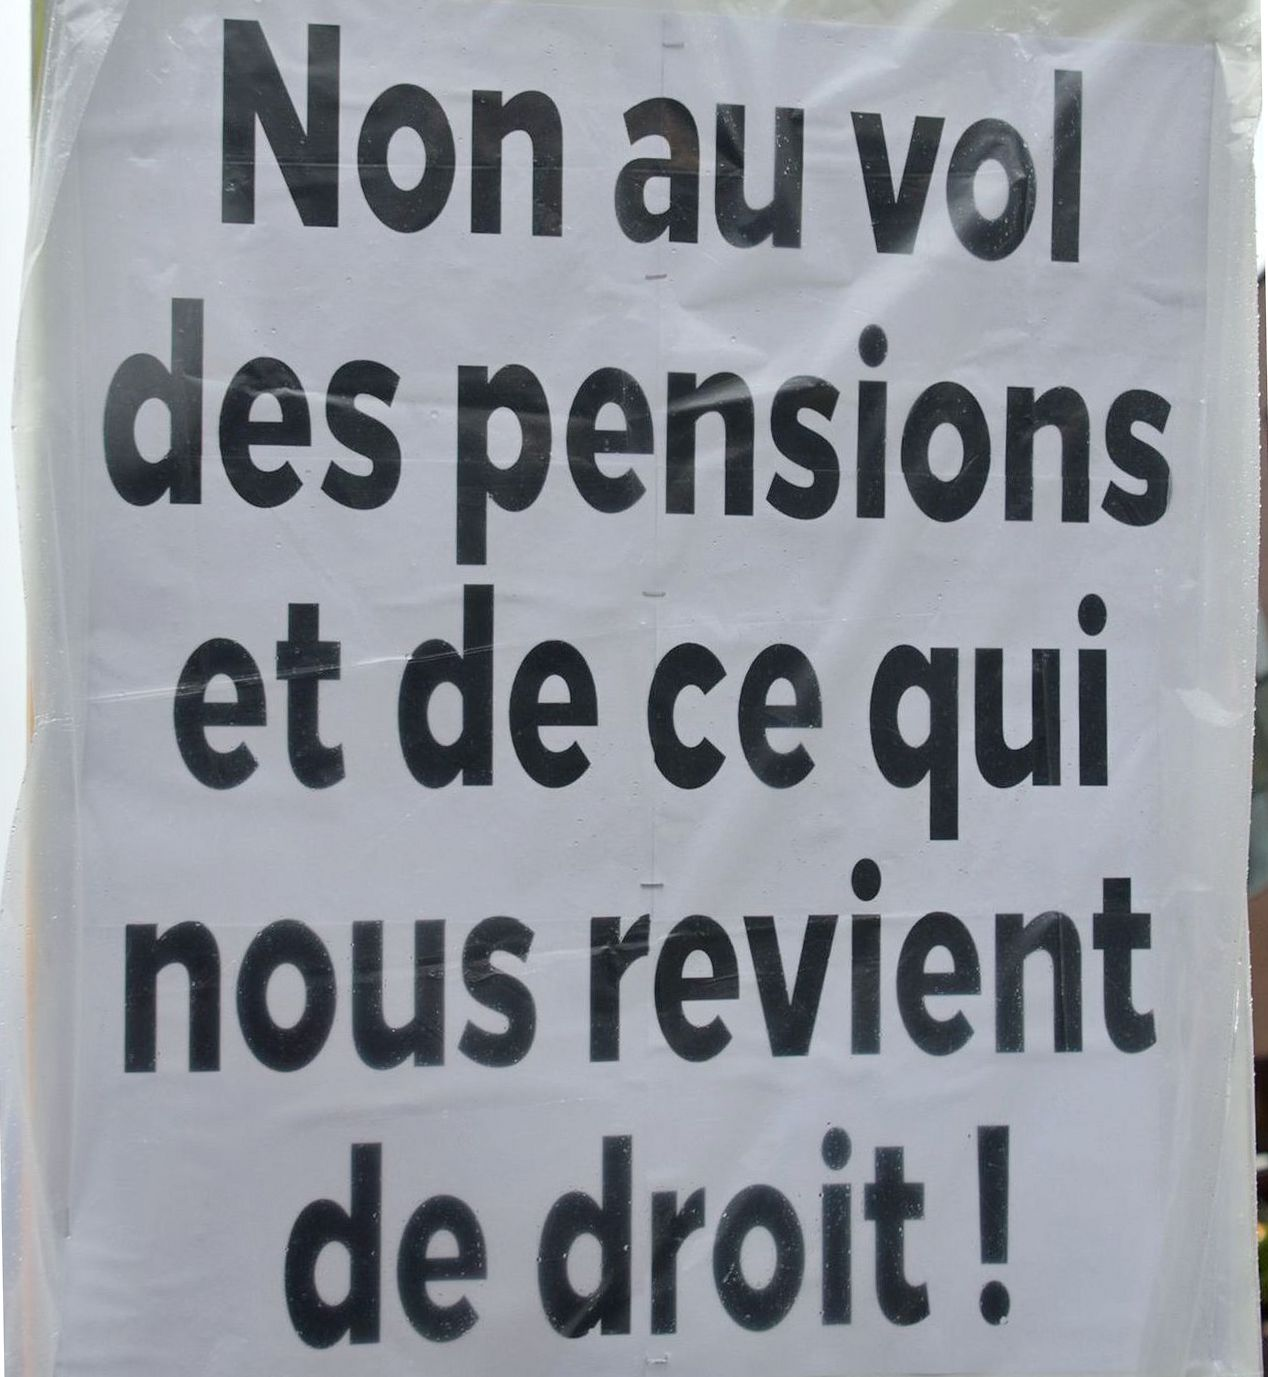 http://cpcml.ca/images2018/WorkersEconomy/PensionsBenefits/Slogans/170501-MontrealPremierMai-56cr.jpg